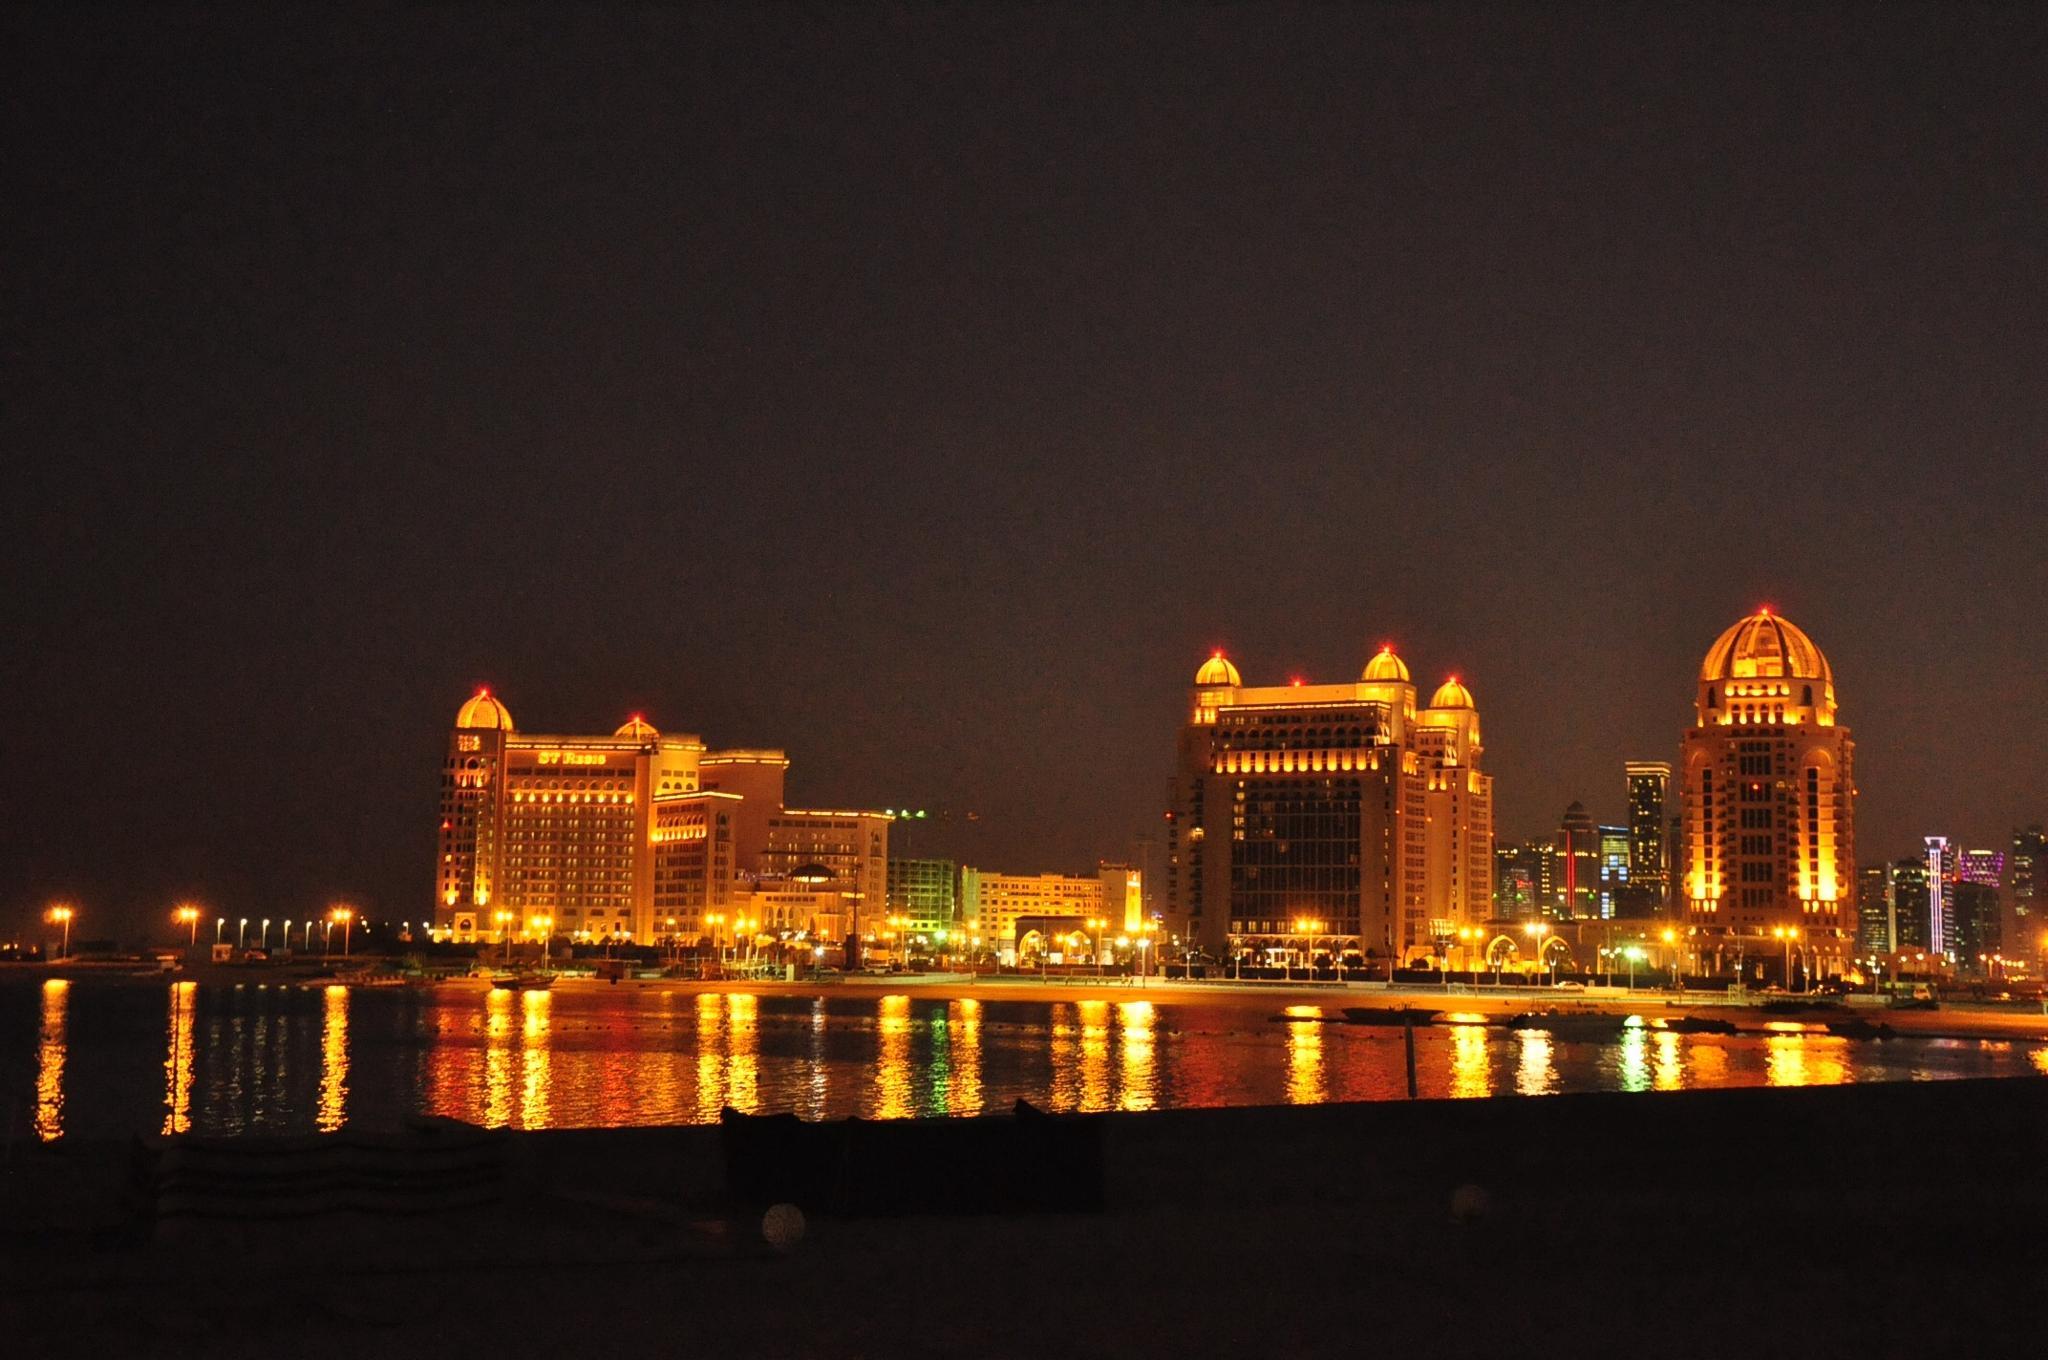 City of Lights  by wyler.devotta